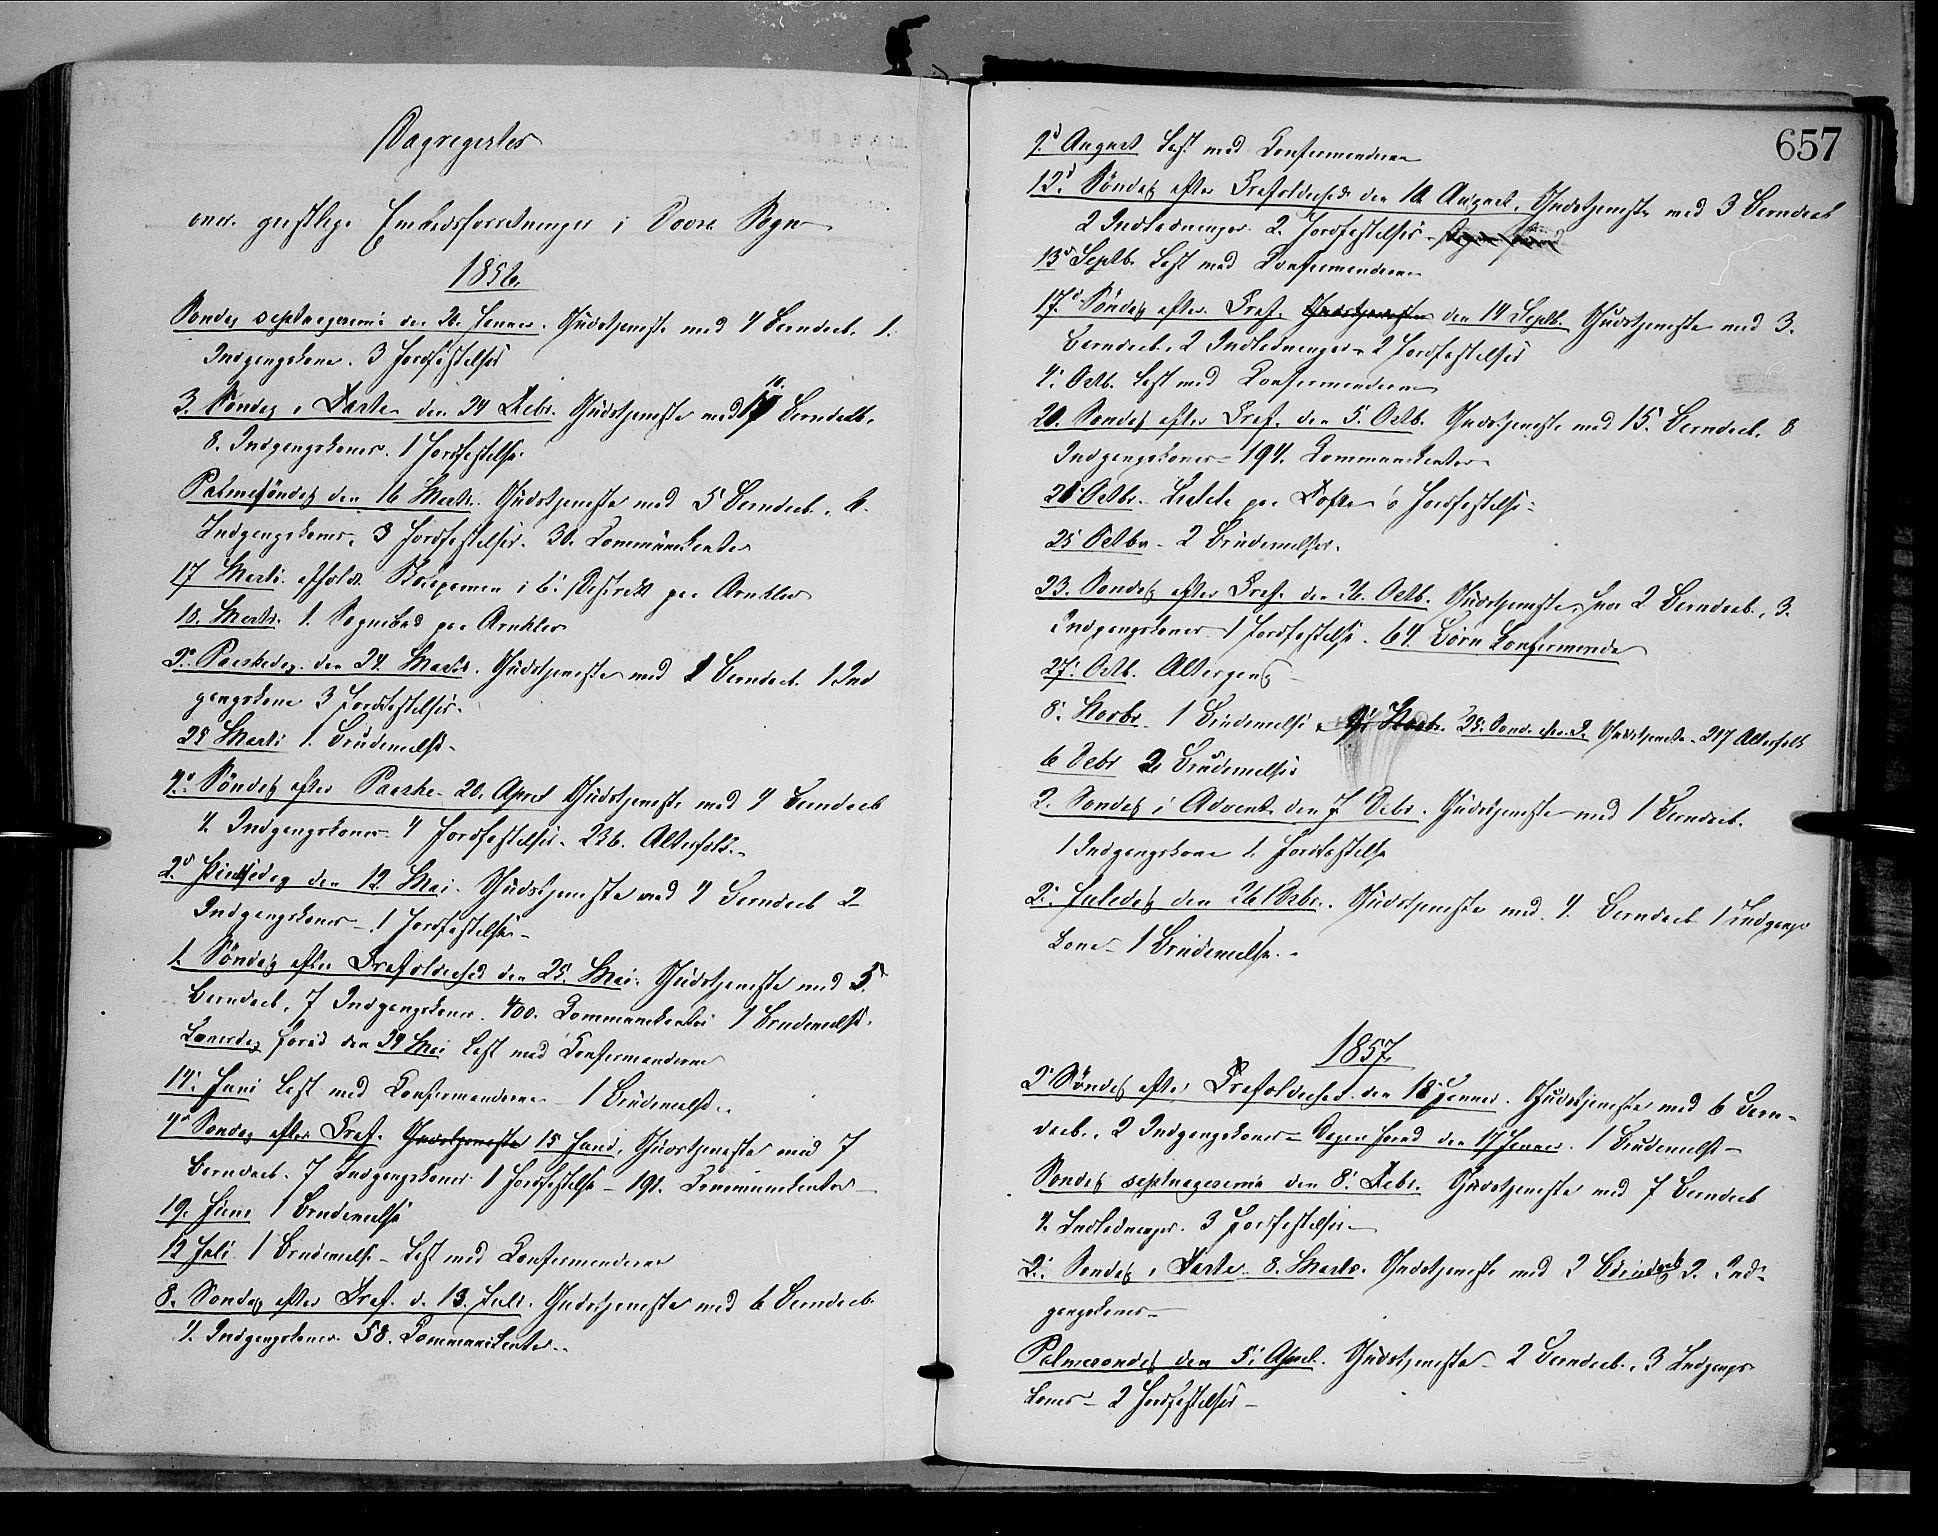 SAH, Dovre prestekontor, Ministerialbok nr. 1, 1854-1878, s. 657